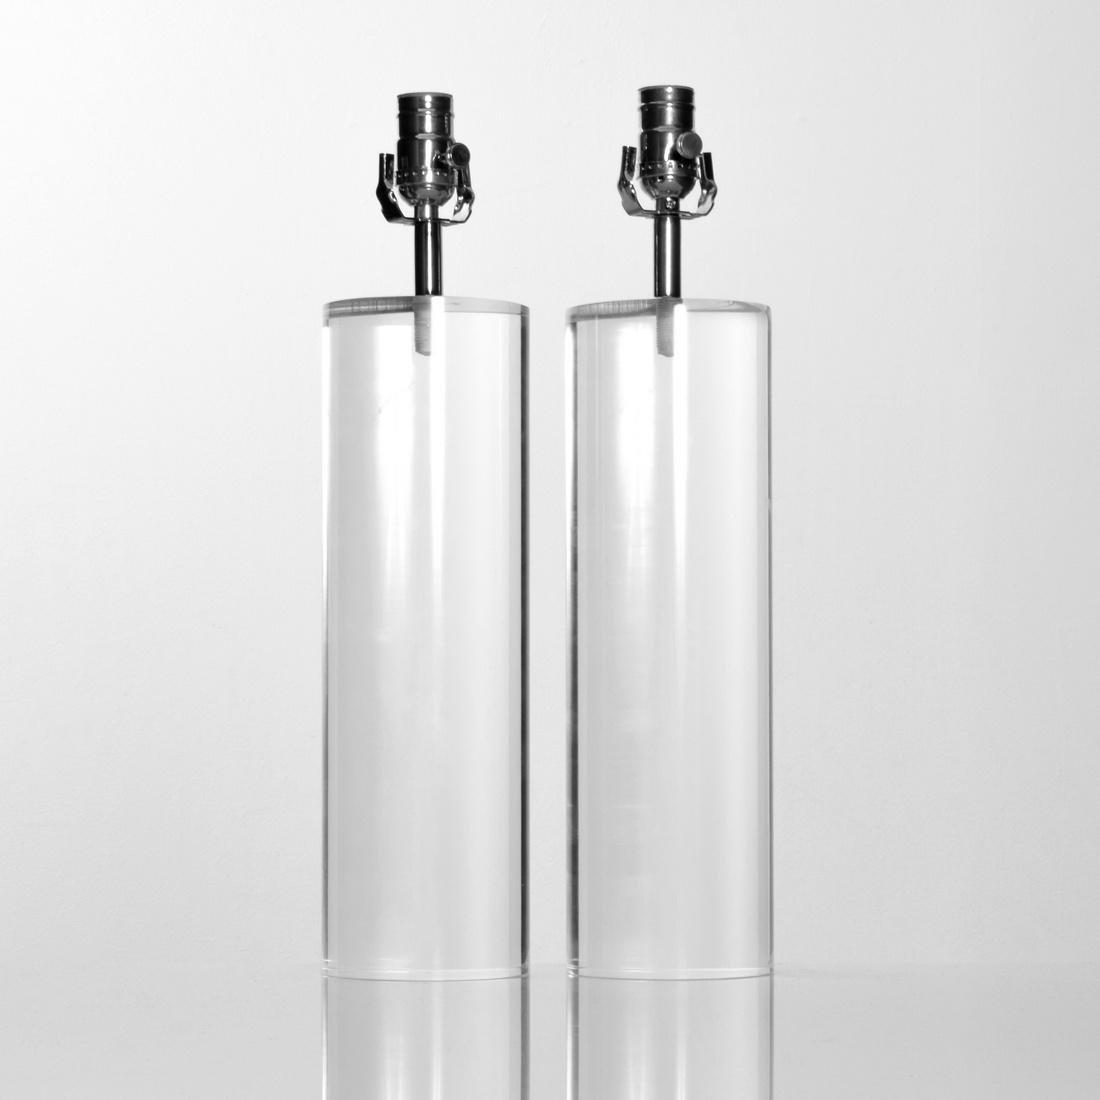 Pair of Lamps, Manner of Karl Springer